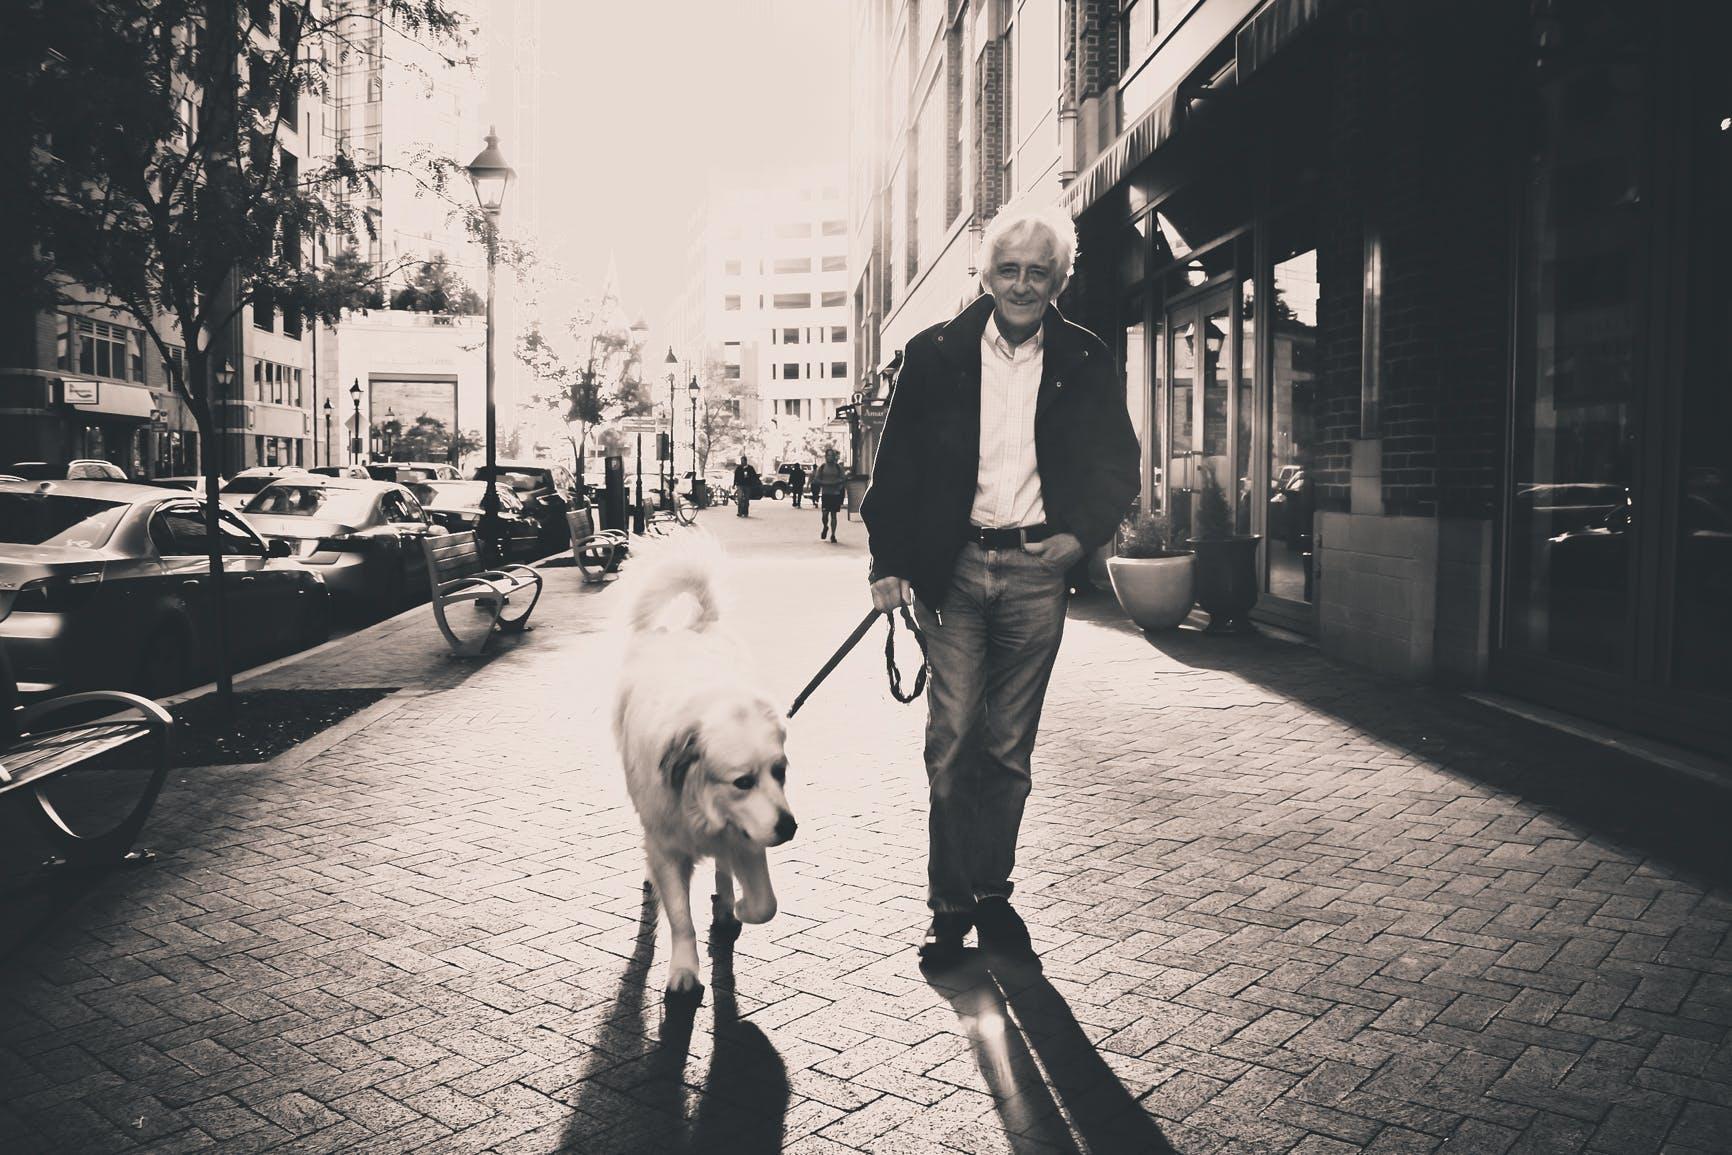 Man Walking With Golden Retriever